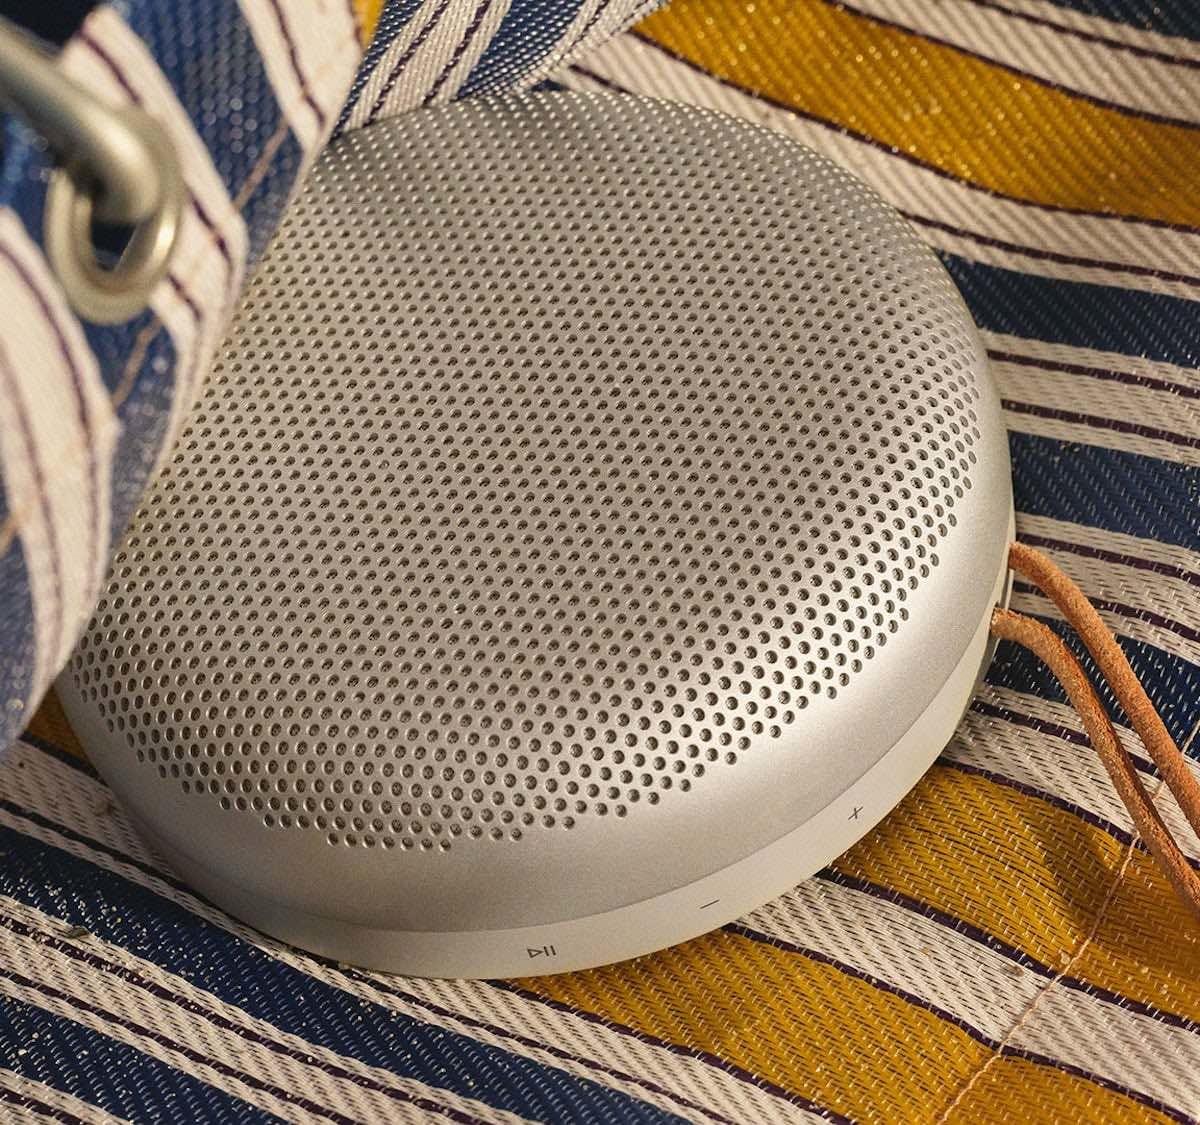 Bang & Olufsen Beosound A1 2nd Gen Wireless Waterproof Speaker plays punchy music